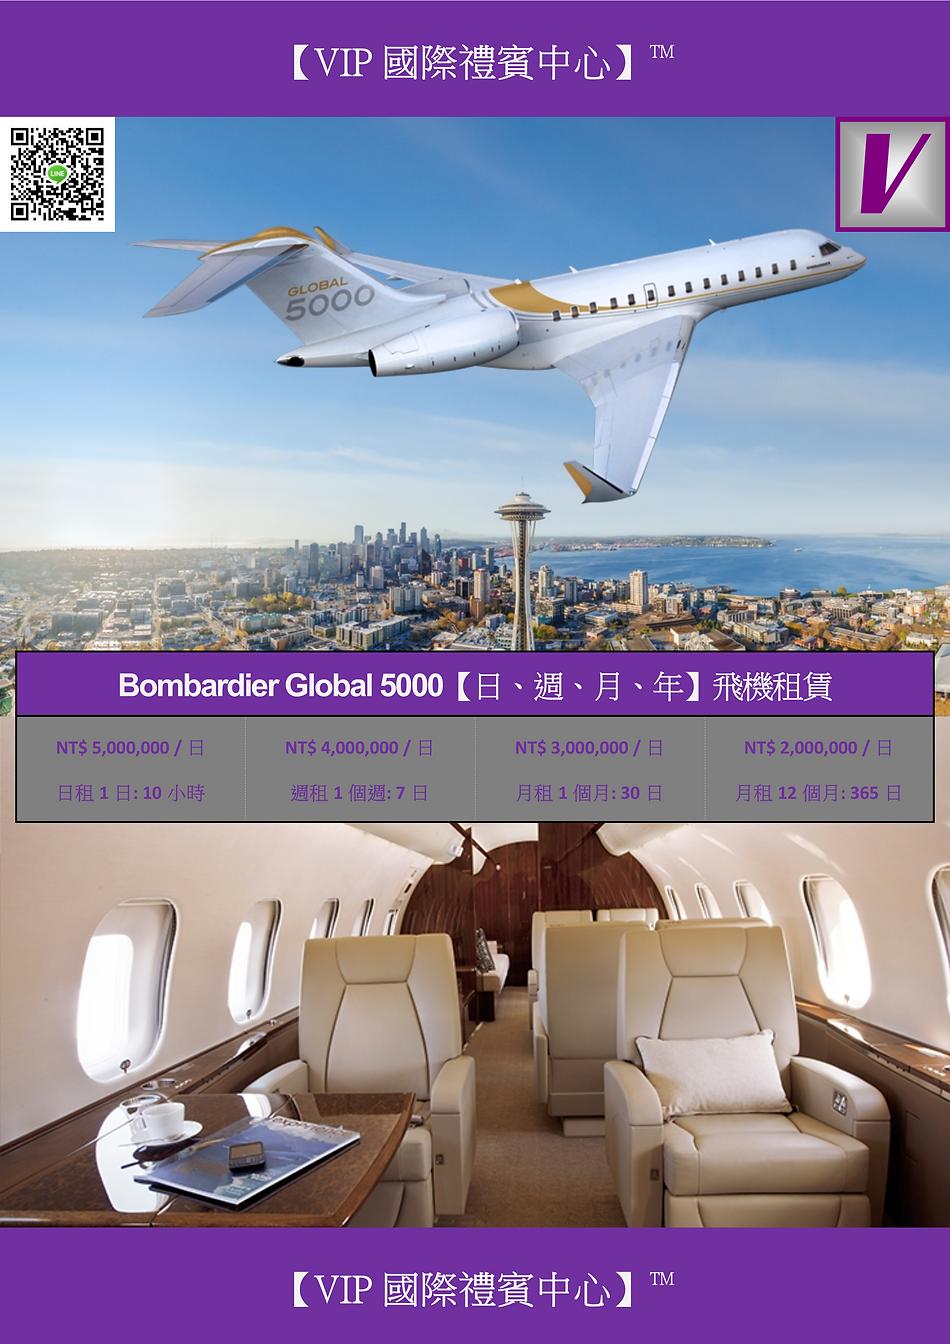 VIP國際禮賓中心 BOMBARDIER GLOBAL 5000 DM.png